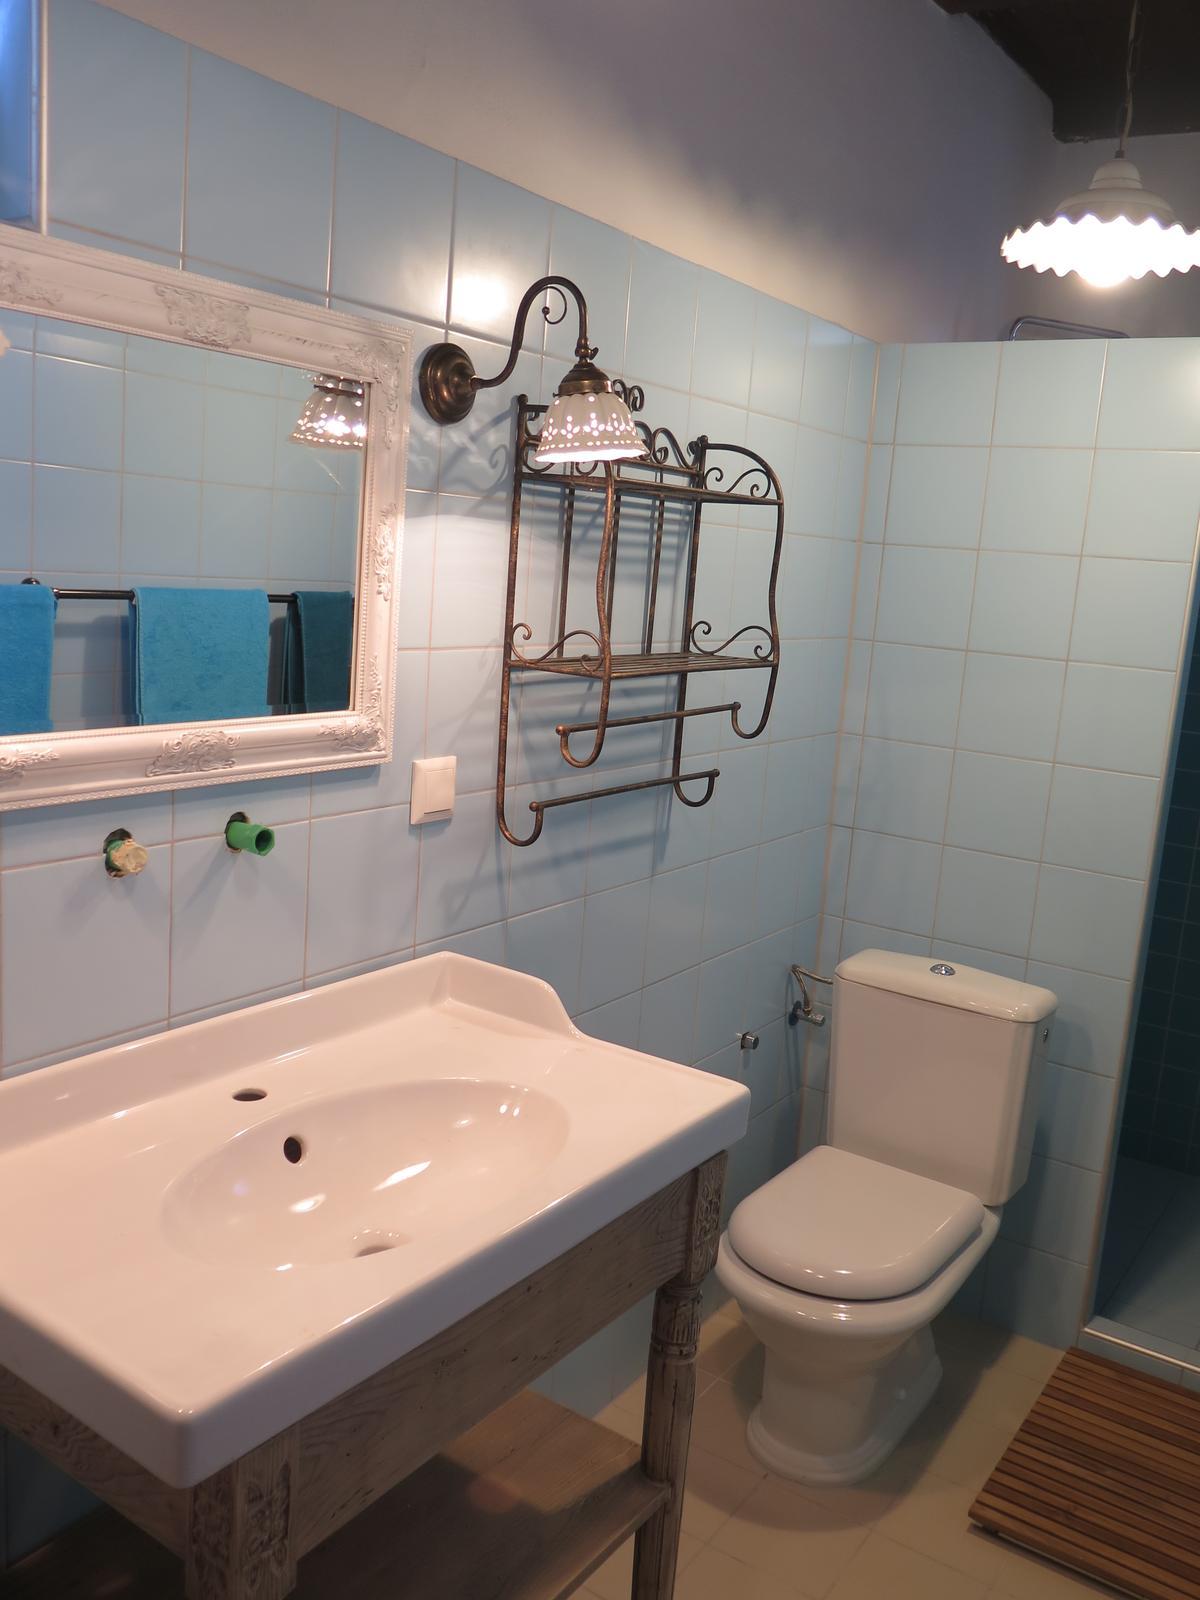 Naša stará a nová kúpelňa - Obrázok č. 3